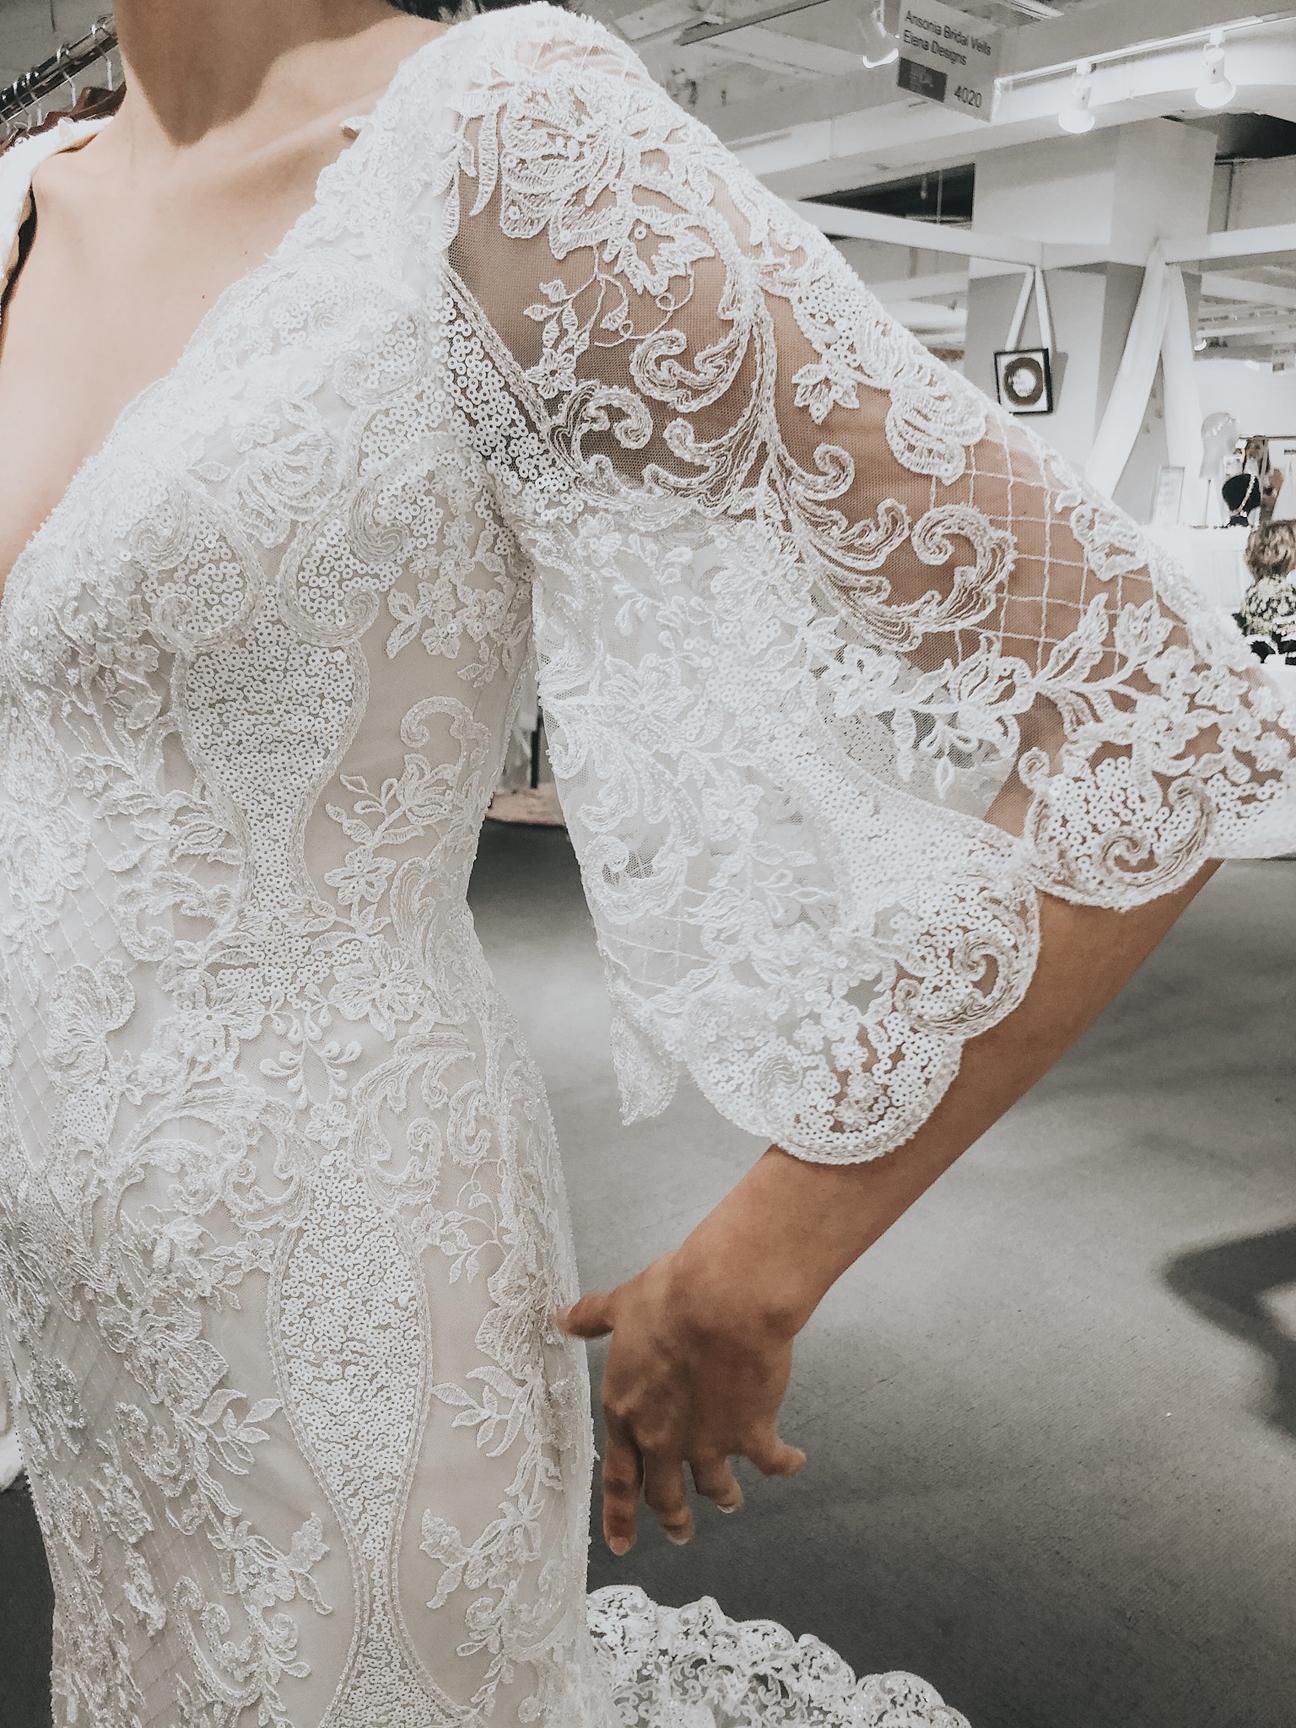 Lis-Simon-2020-Market-wedding-dress-couture-closet-highneck-wide-bell-sleeves.jpg